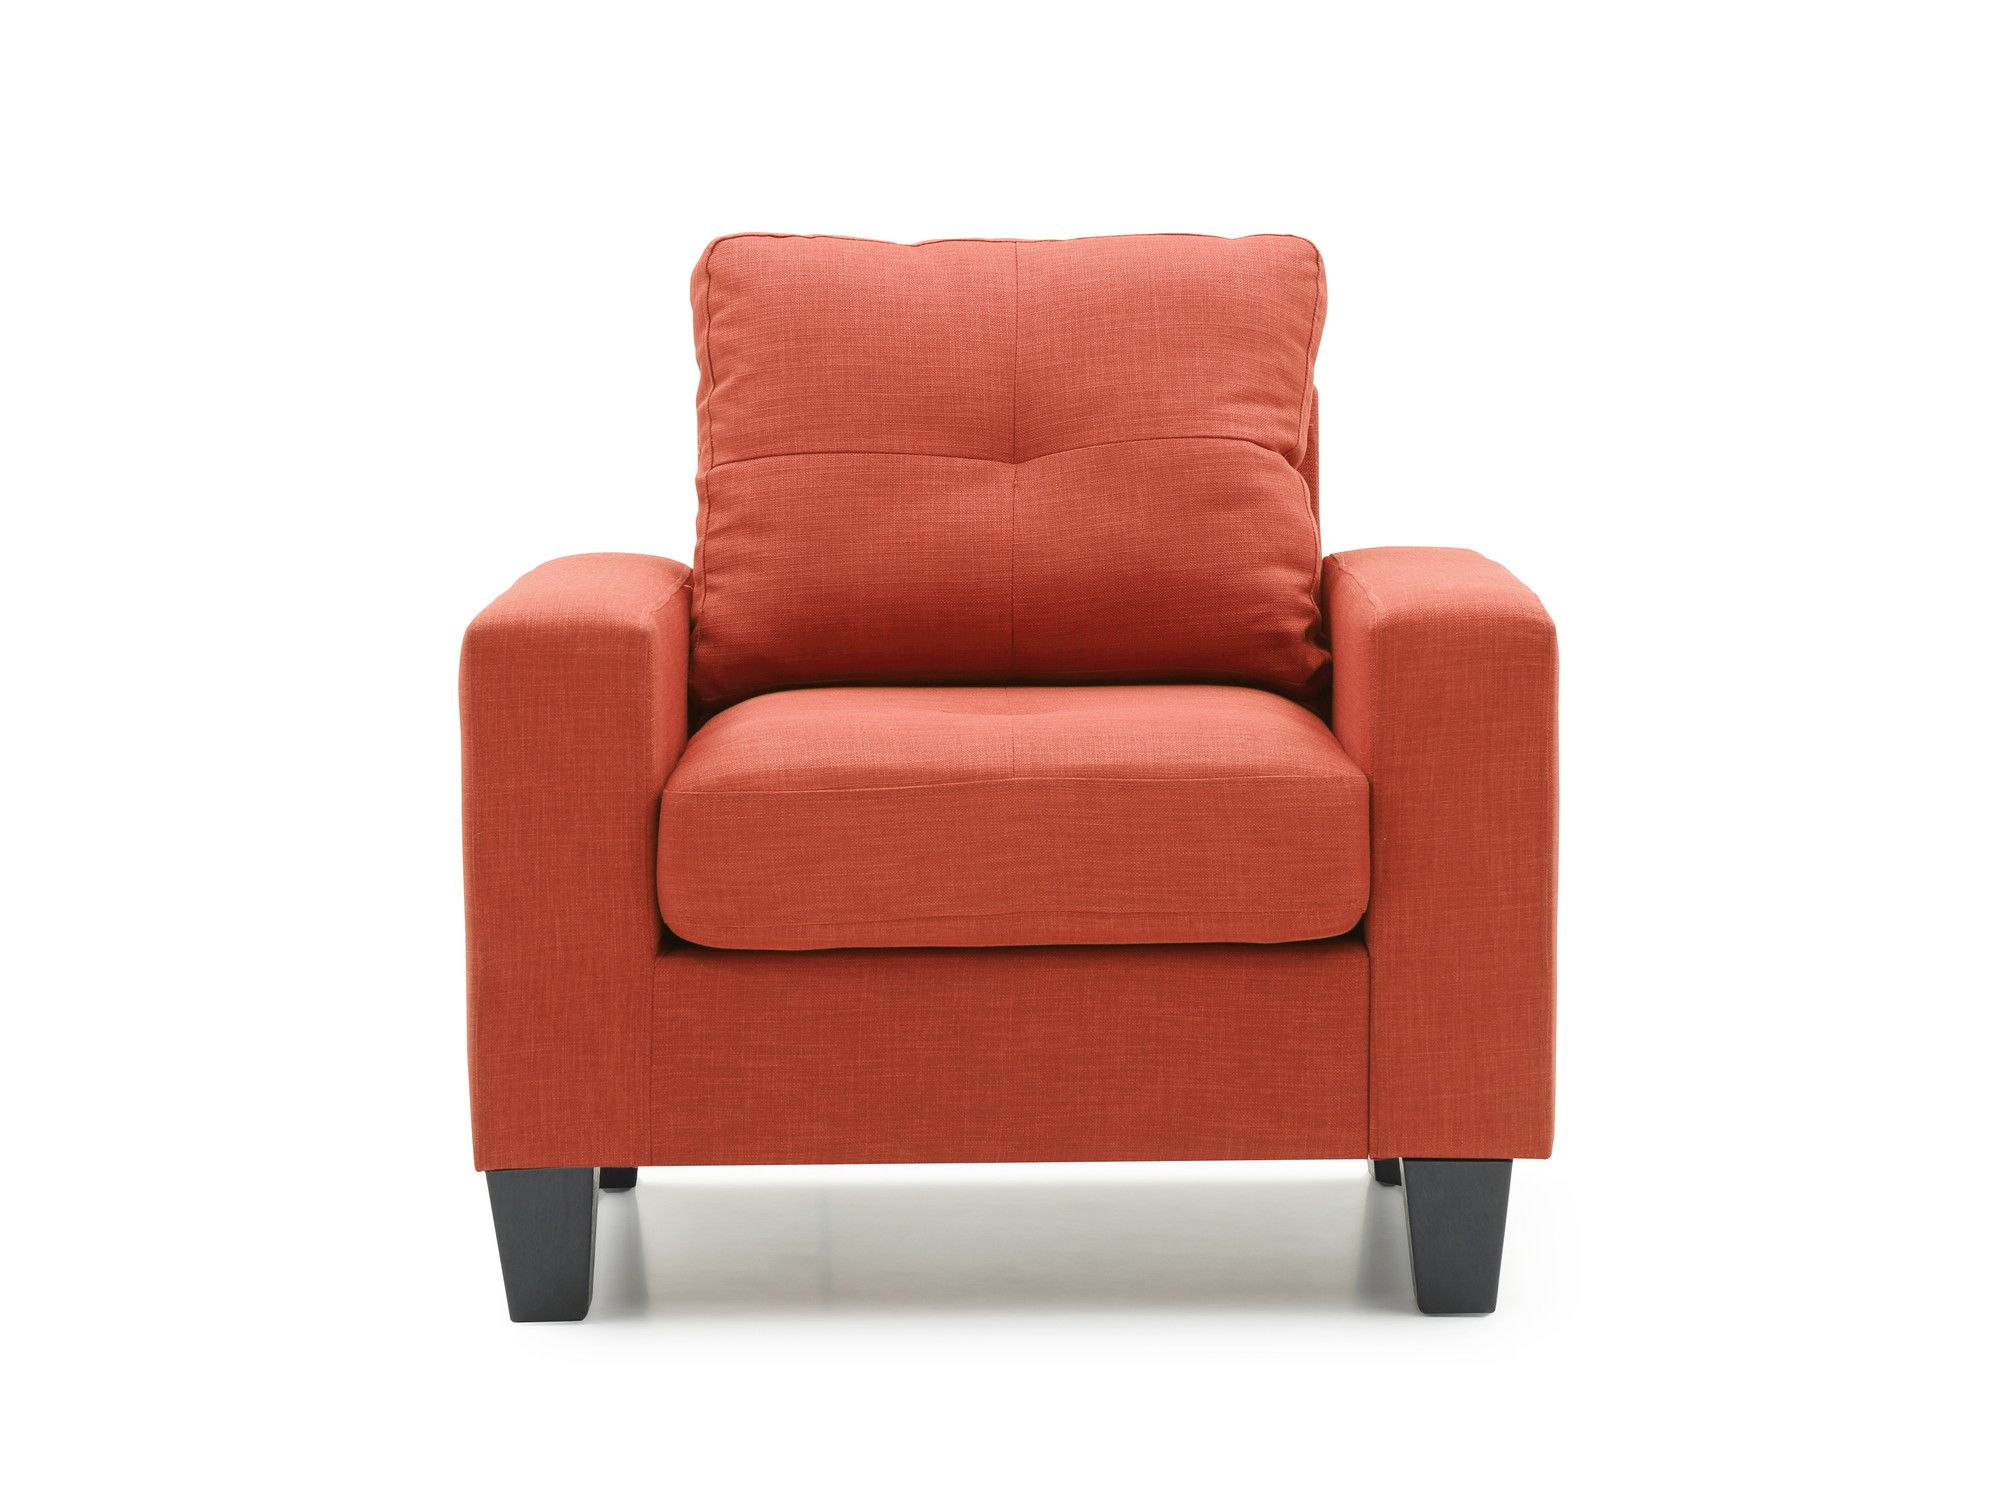 Chandler Slipper Chair Grey Accent Chair Armchair